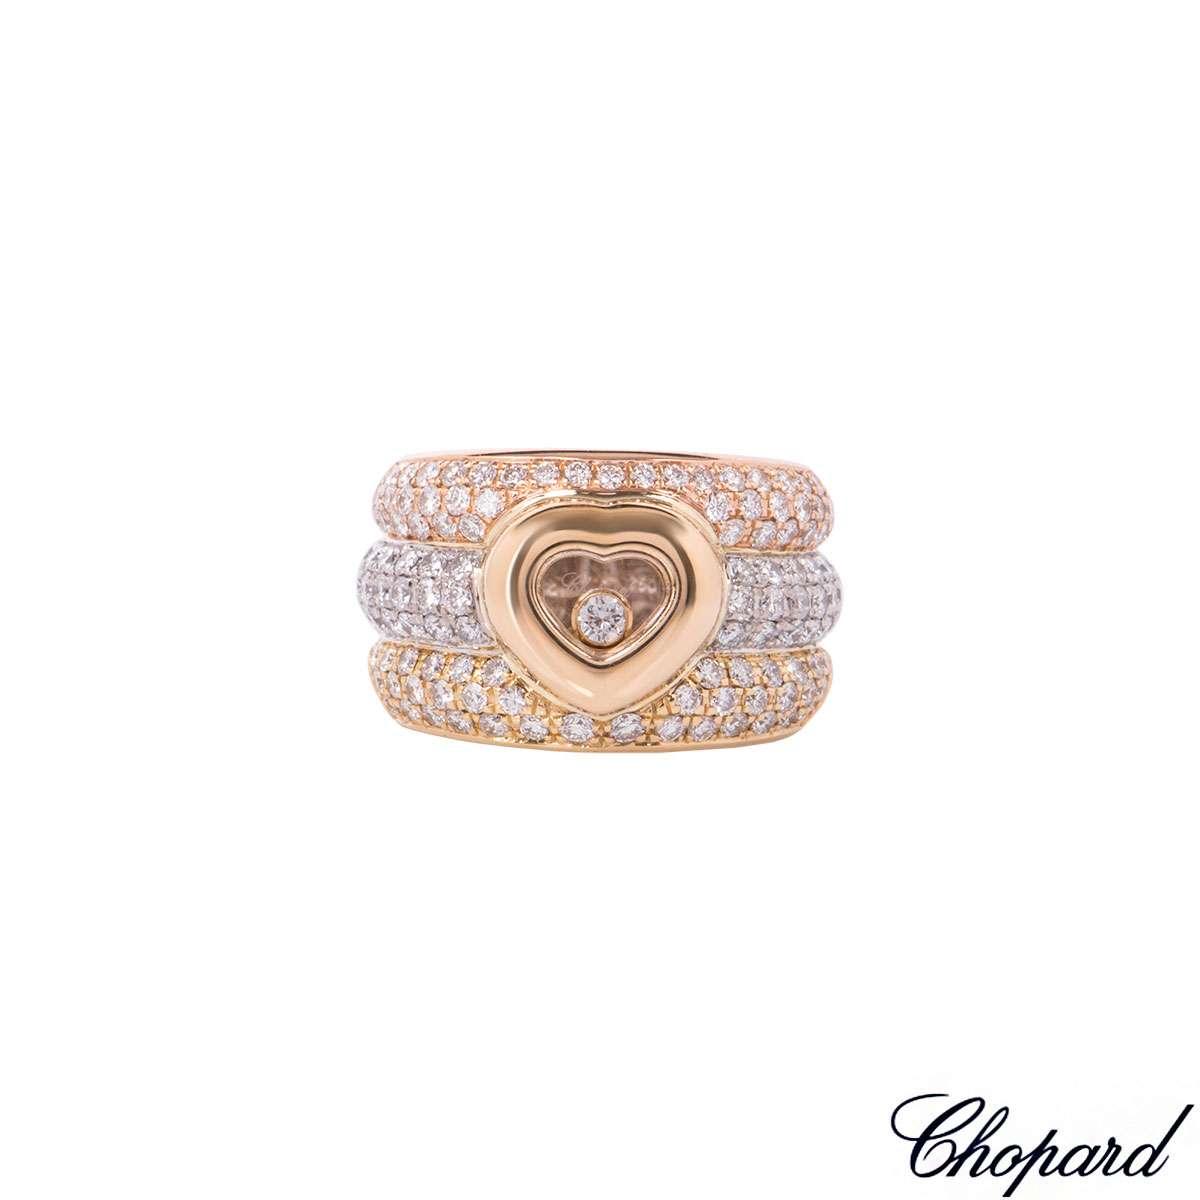 Chopard Tri-Colour Gold Happy Diamonds Ring 82/2271-20